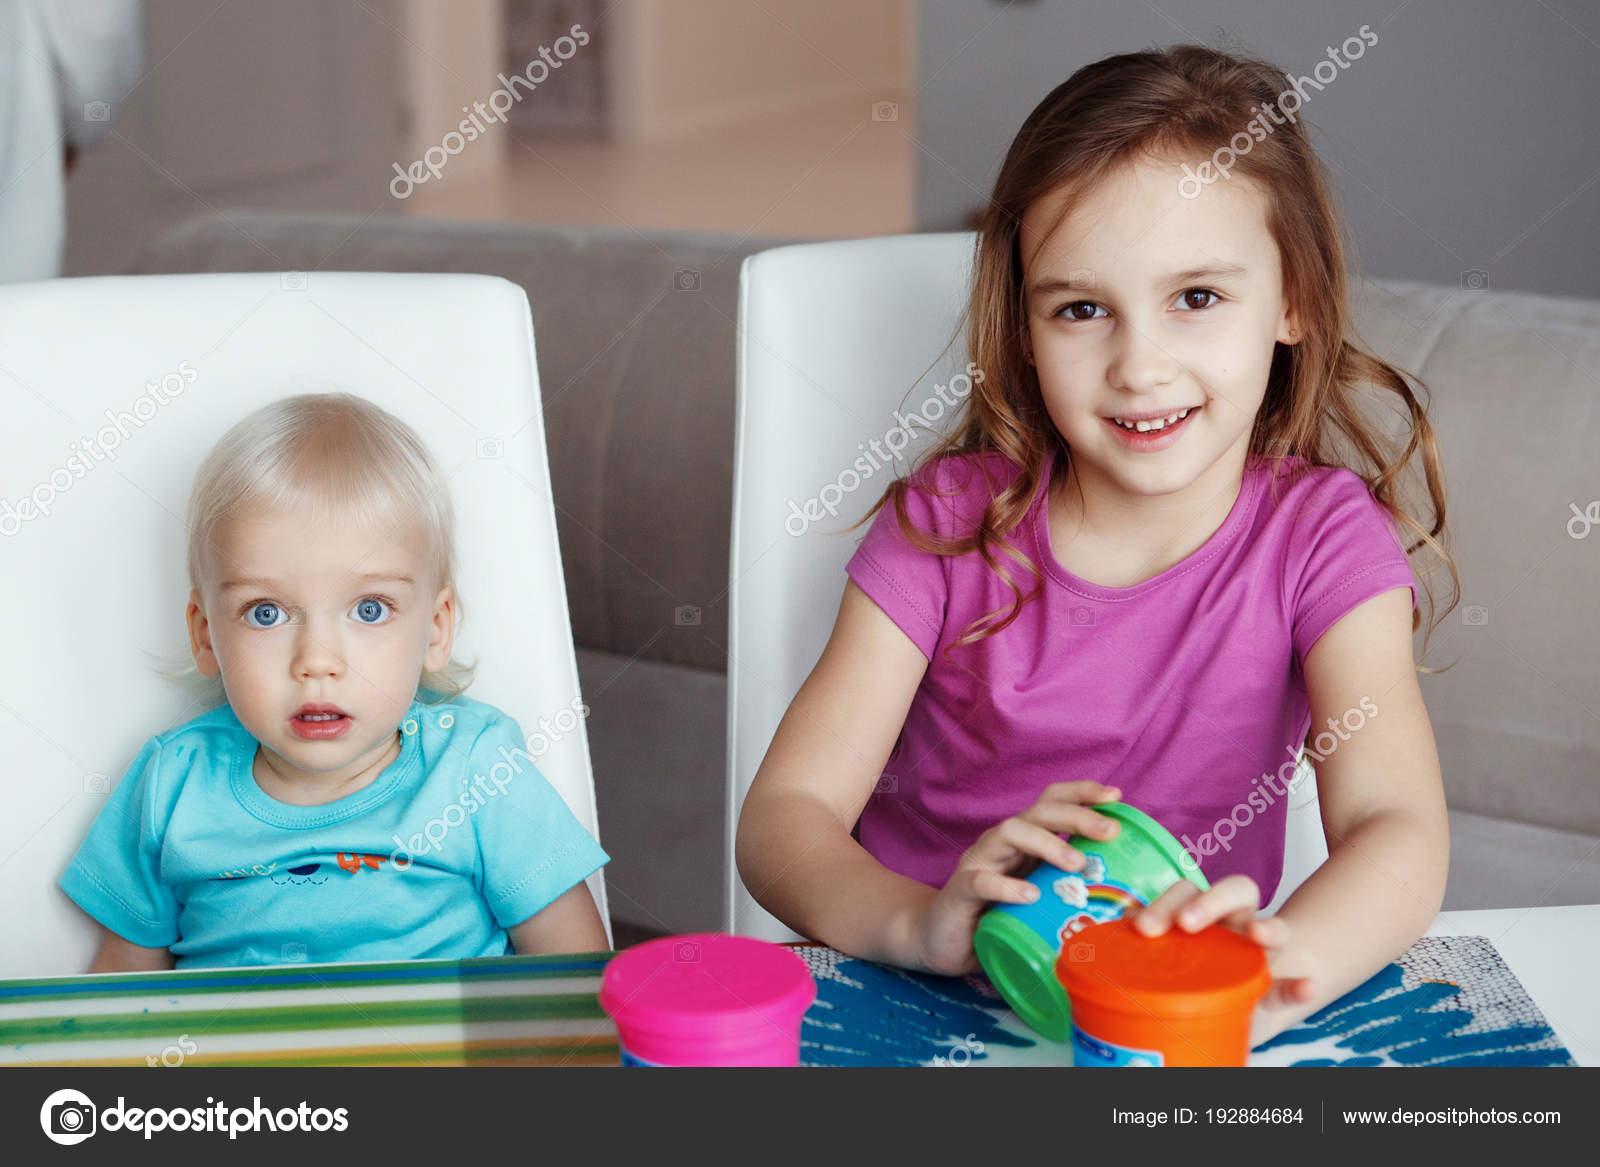 2118e34bc5f Δύο χαρούμενα παιδιά ξανθό αγόρι και κορίτσι παίζει κάθεται στο ...